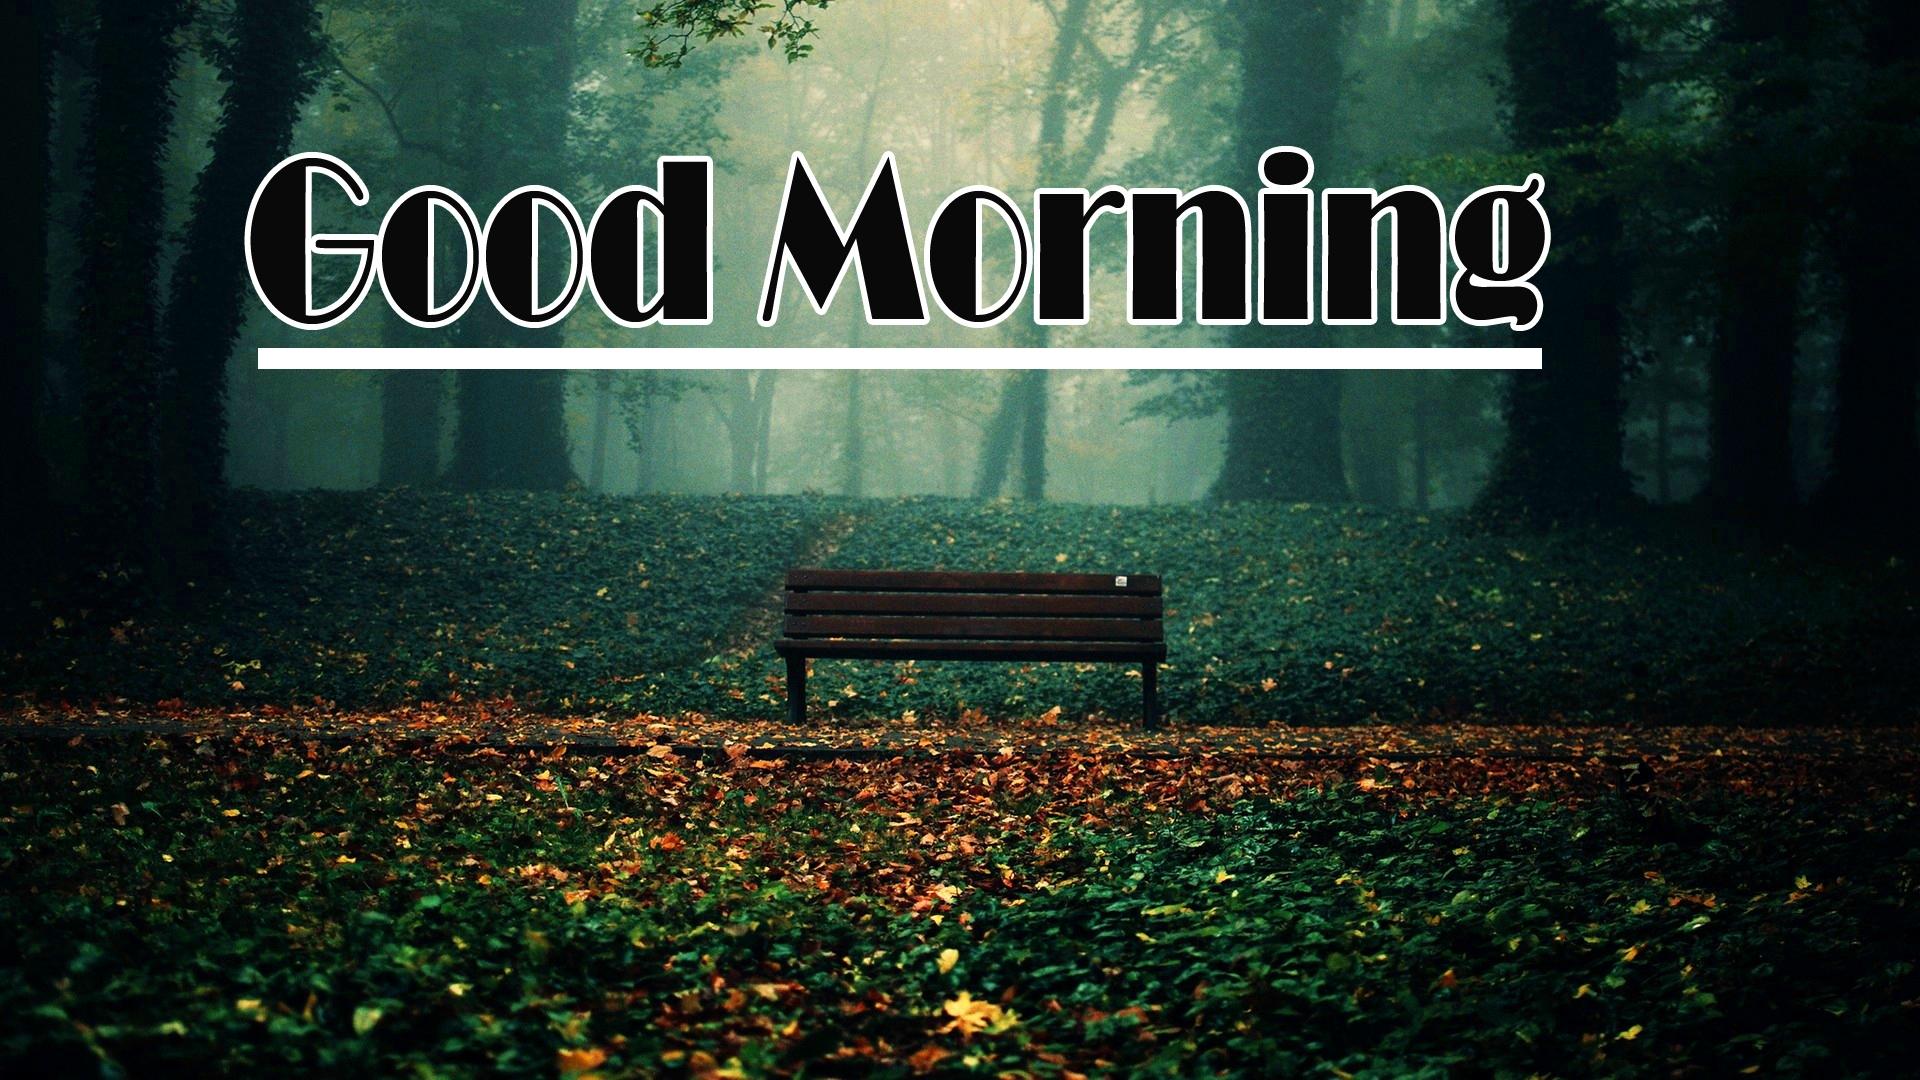 Good Morning Images Wallpaper Free Download